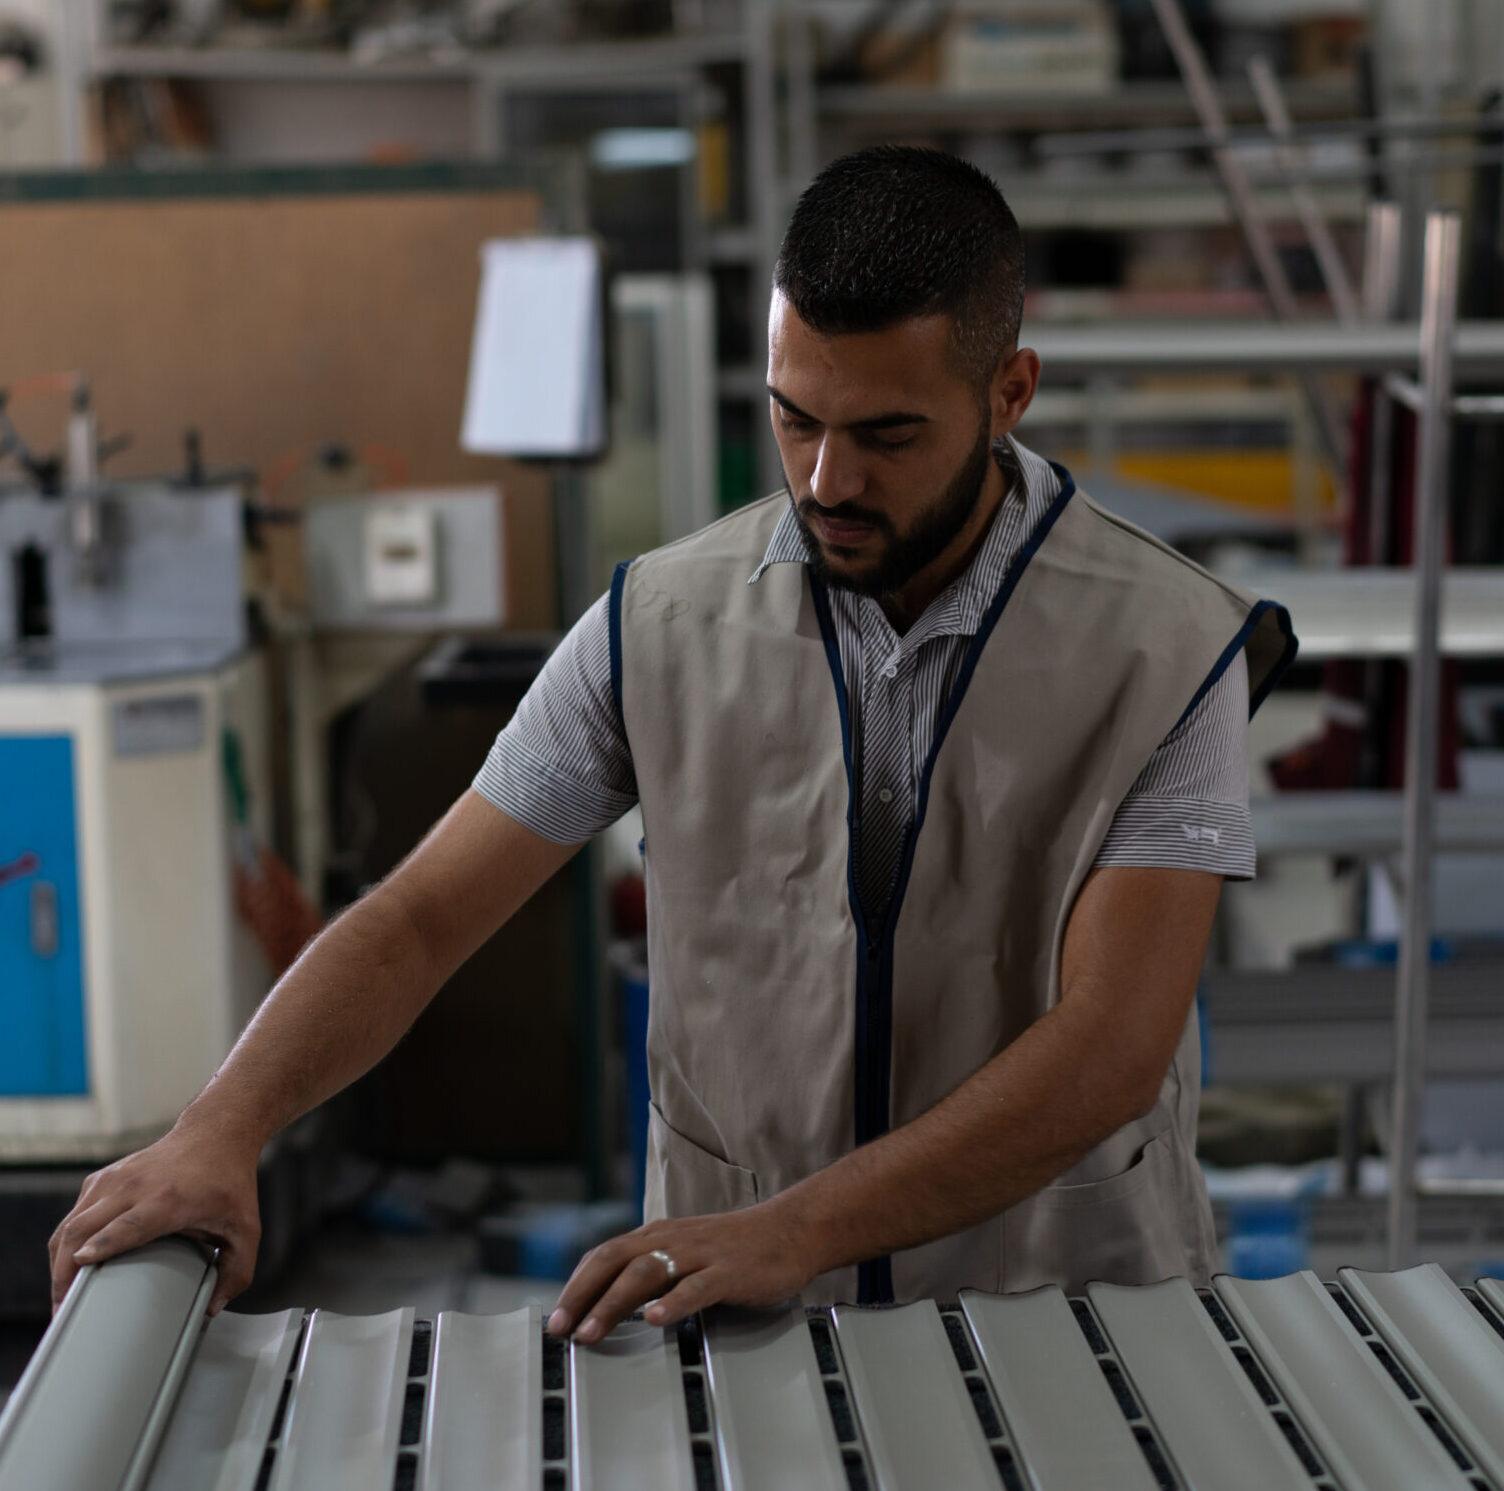 Worker fixing a window shutter at a factory